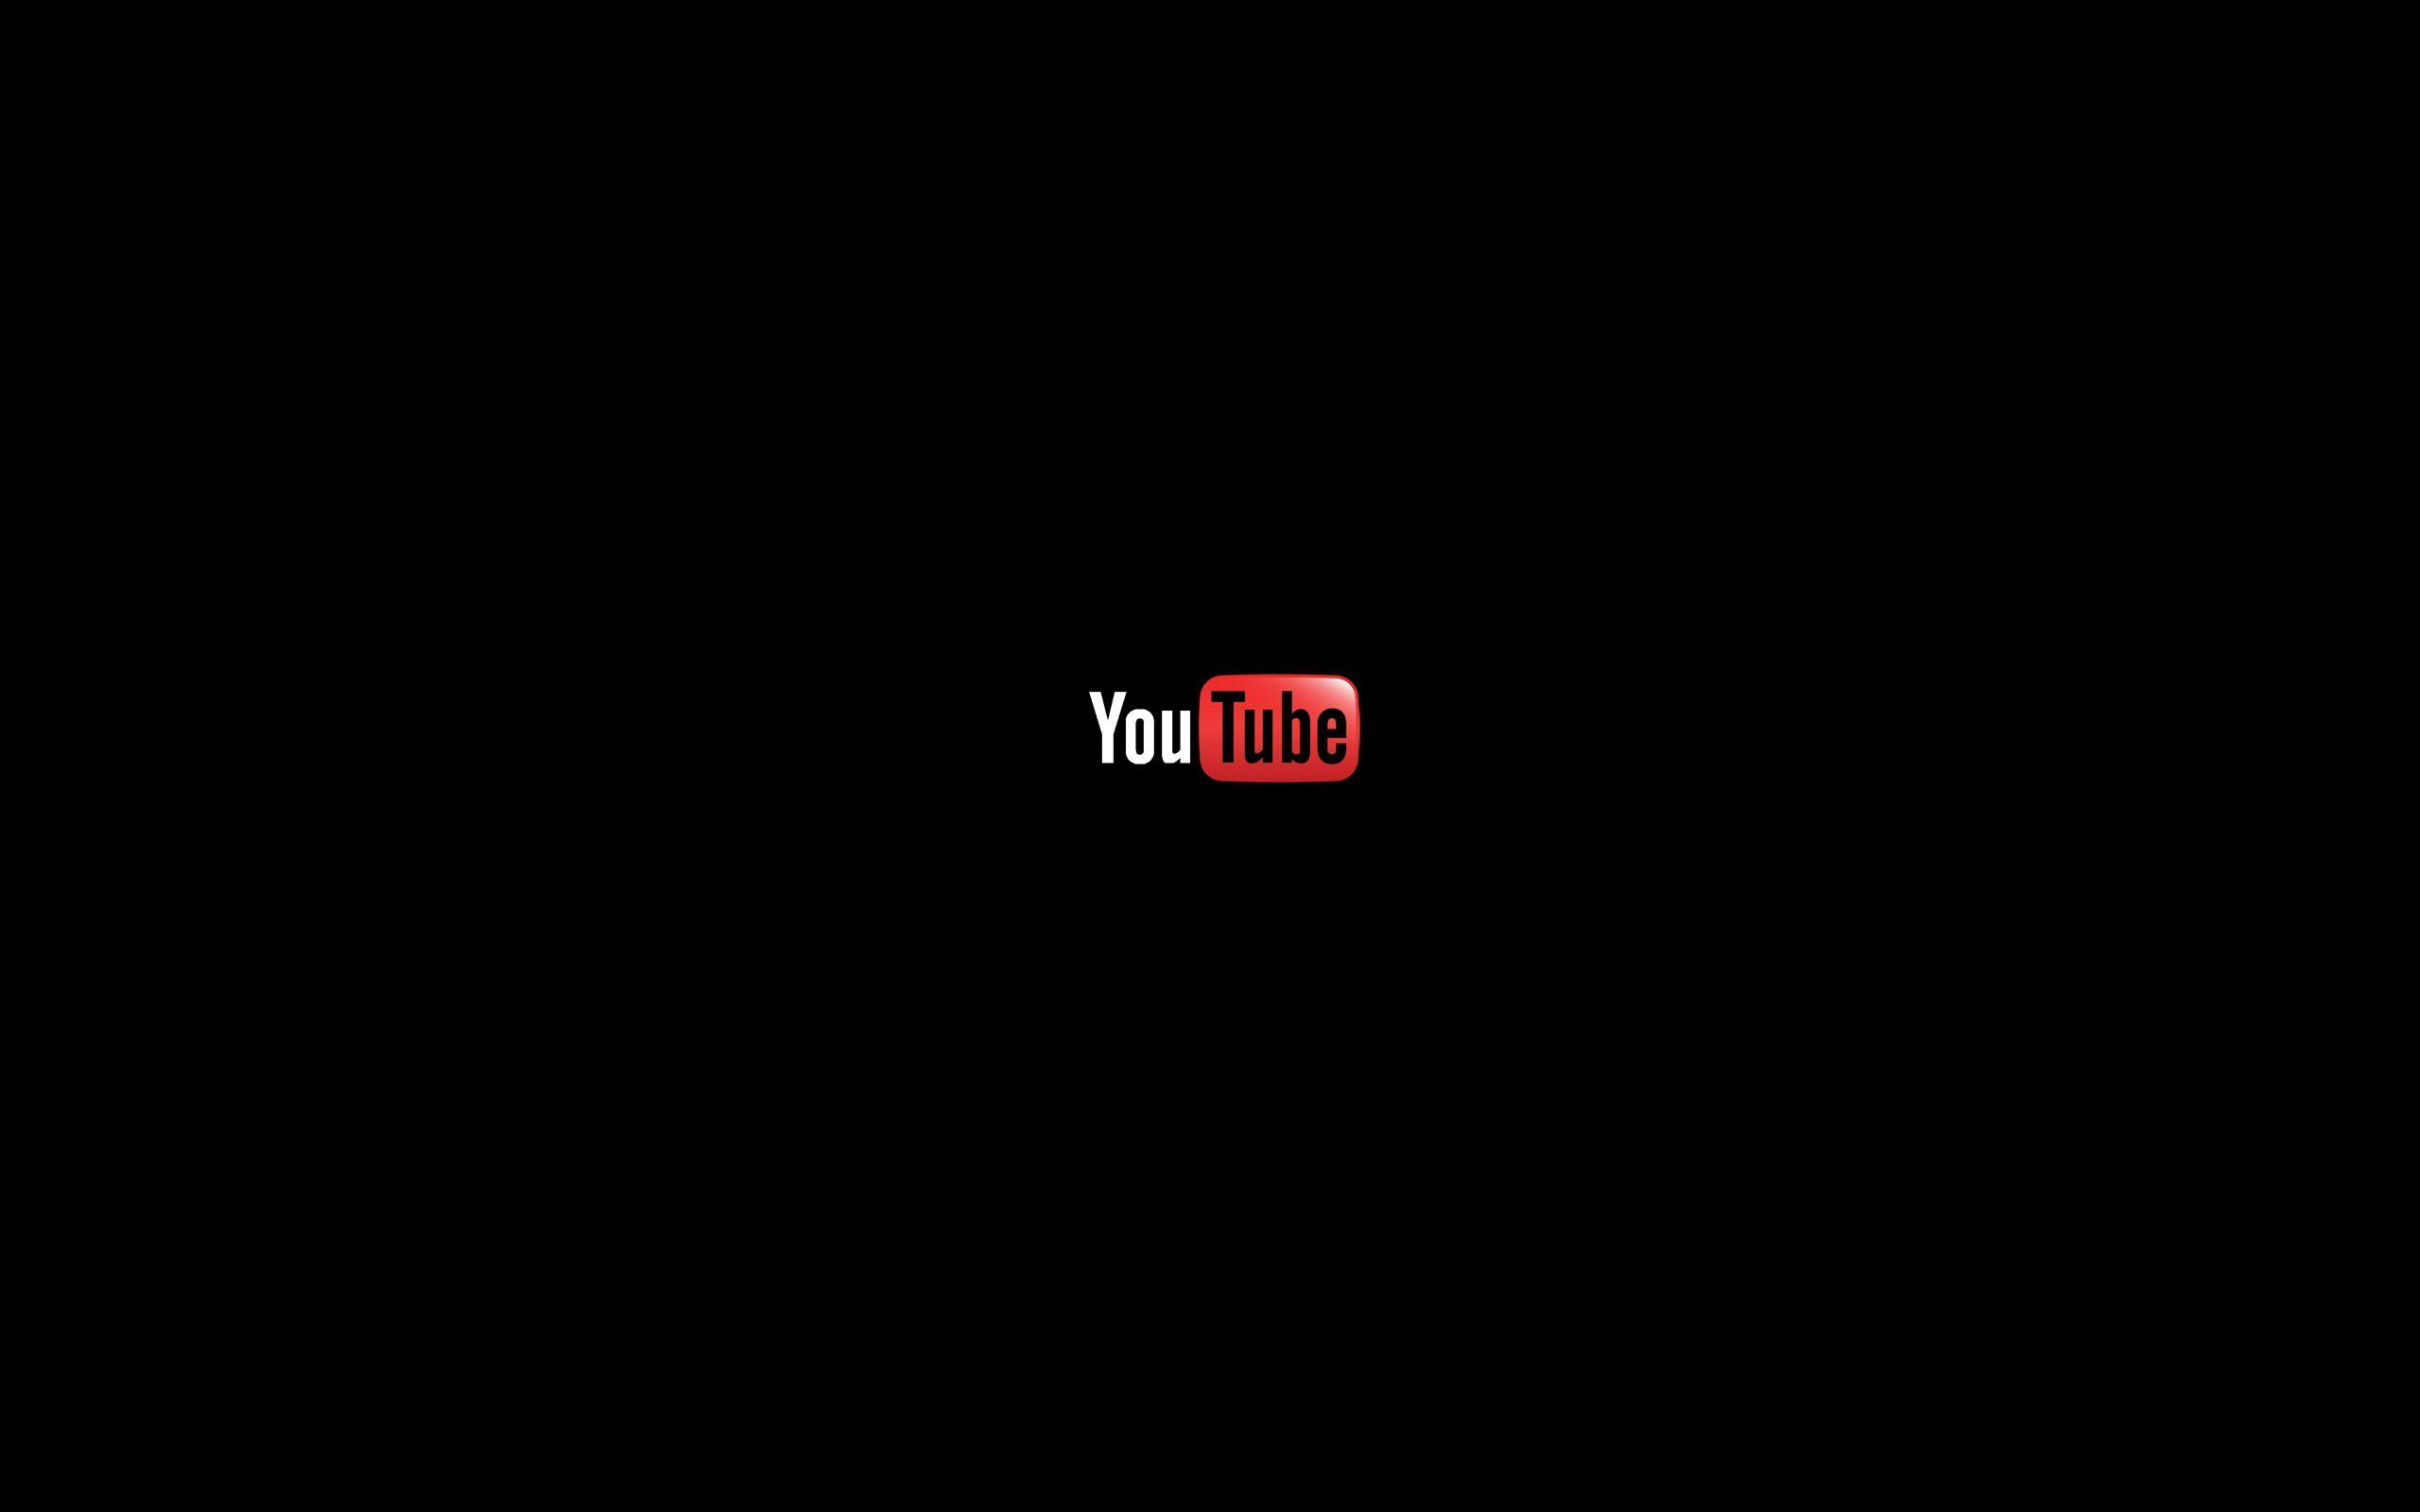 youtube widescreen wallpaper 523